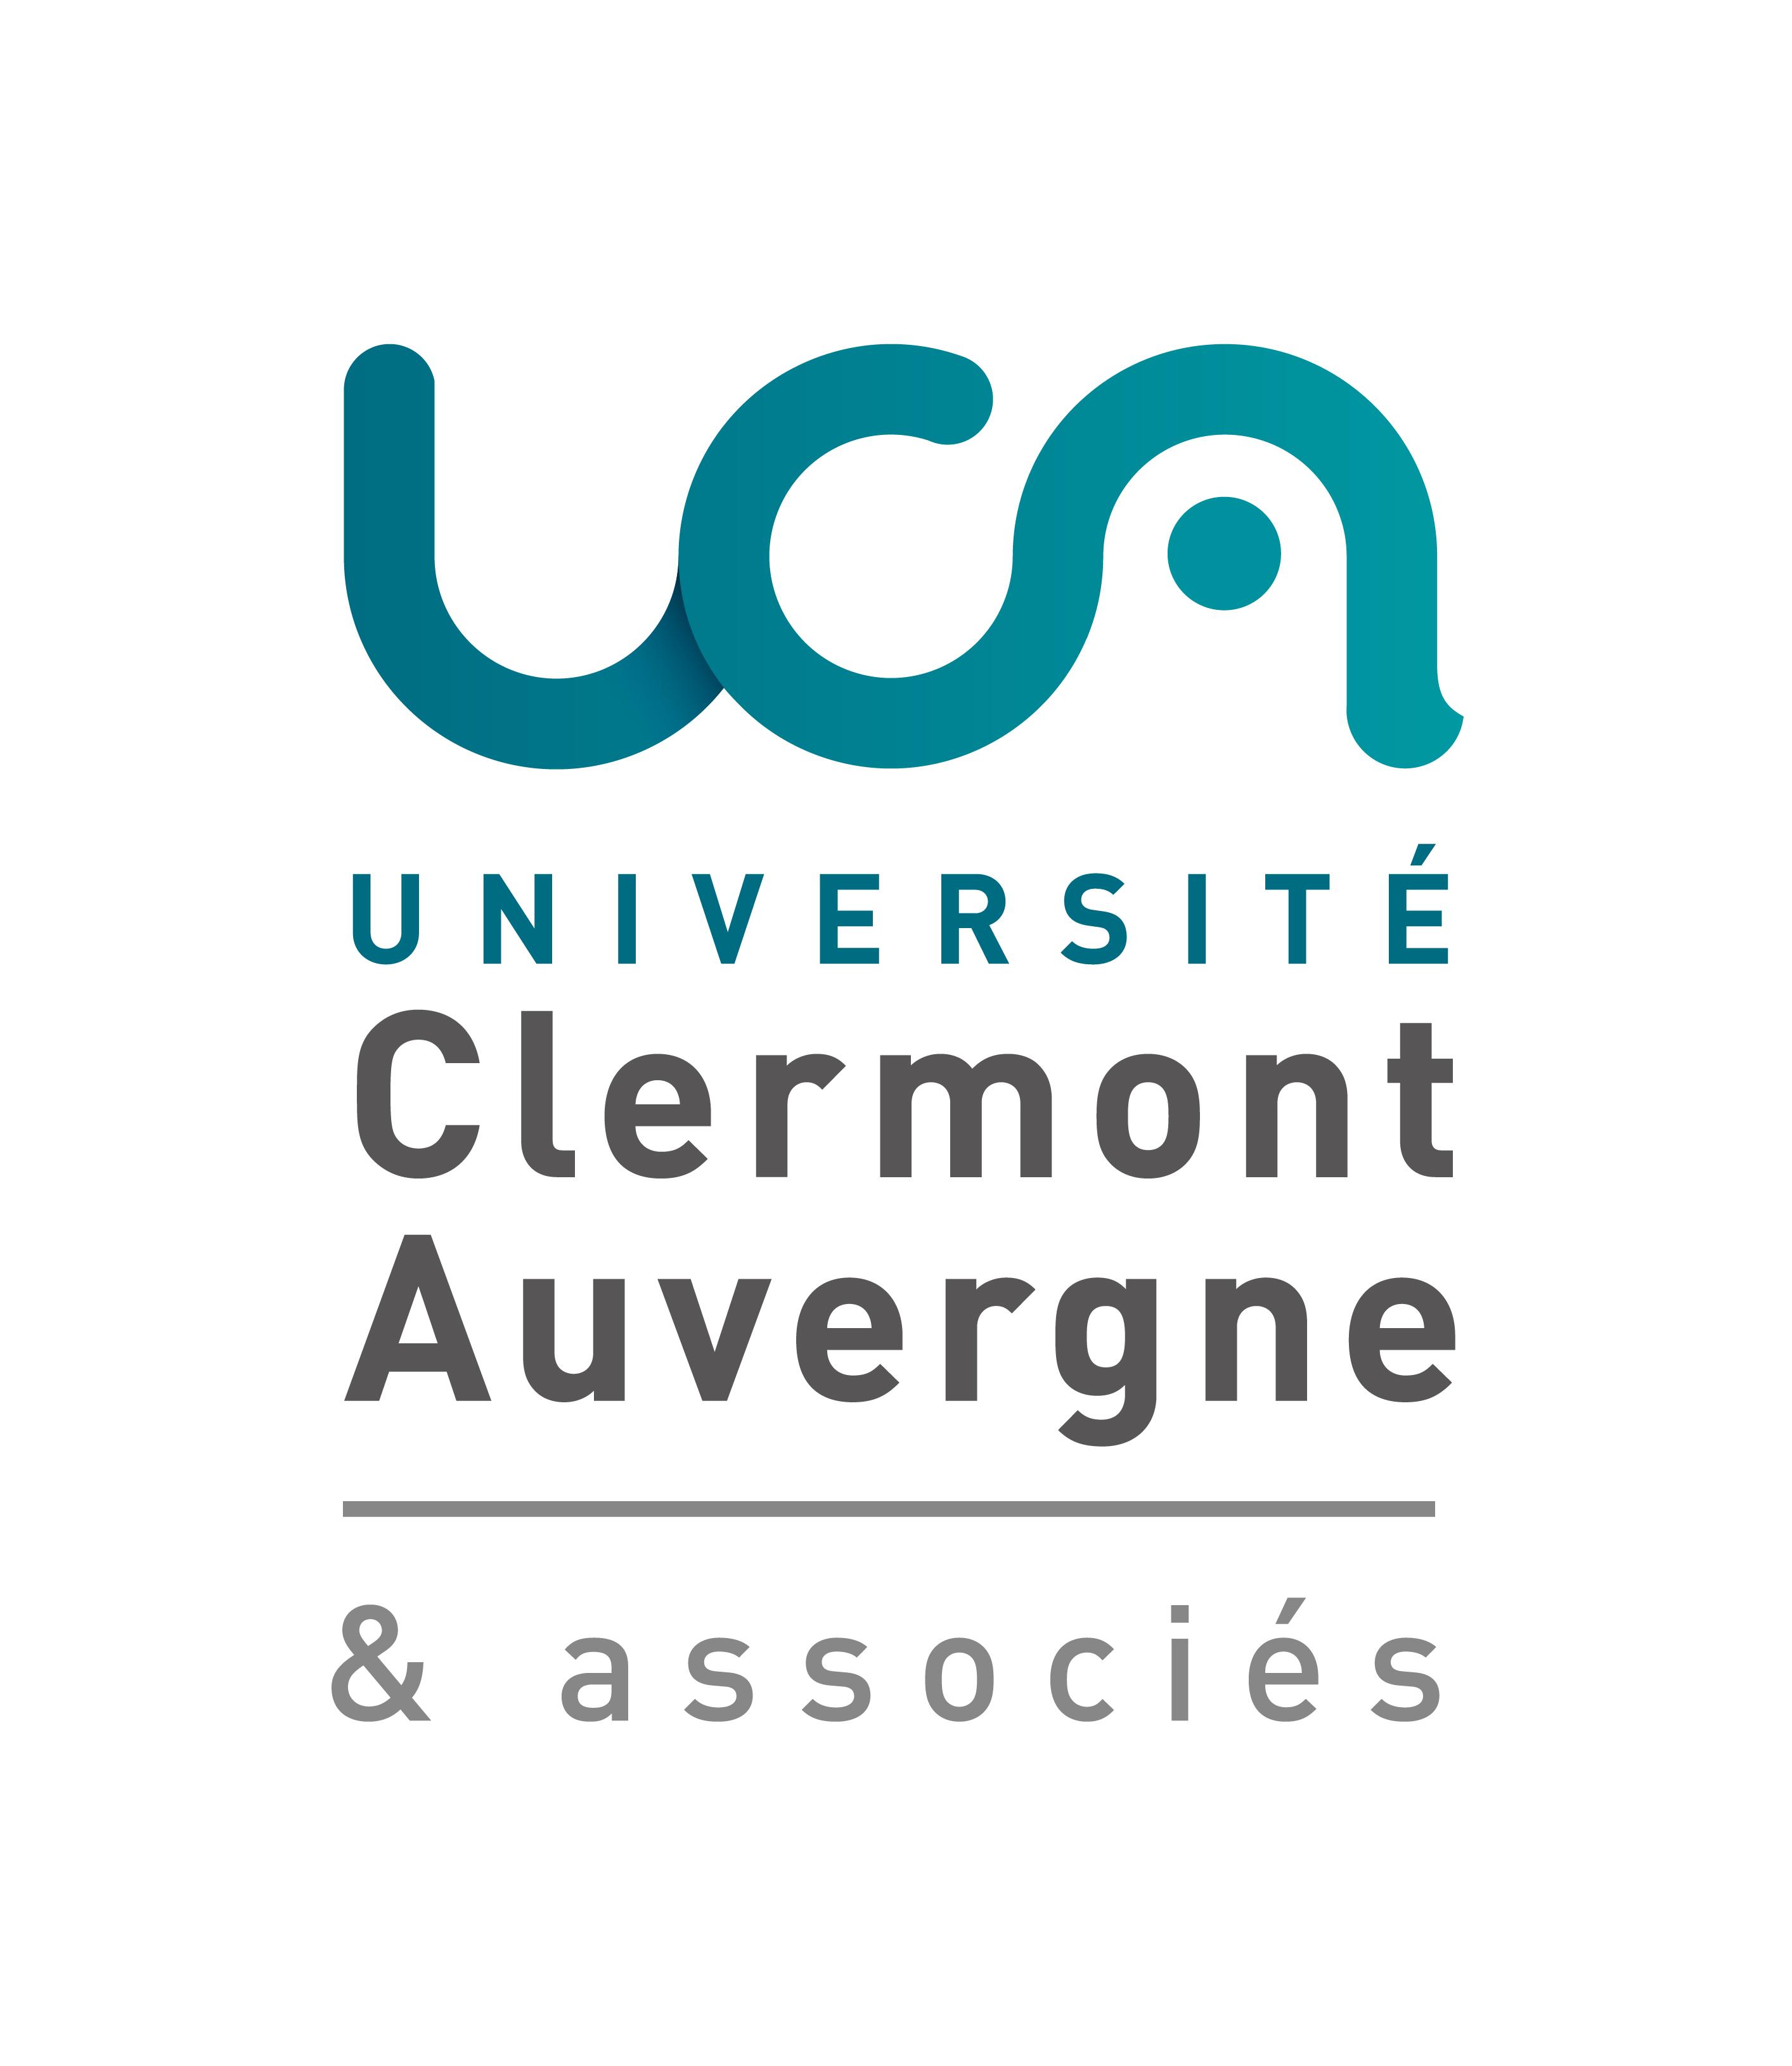 logo_uc2a